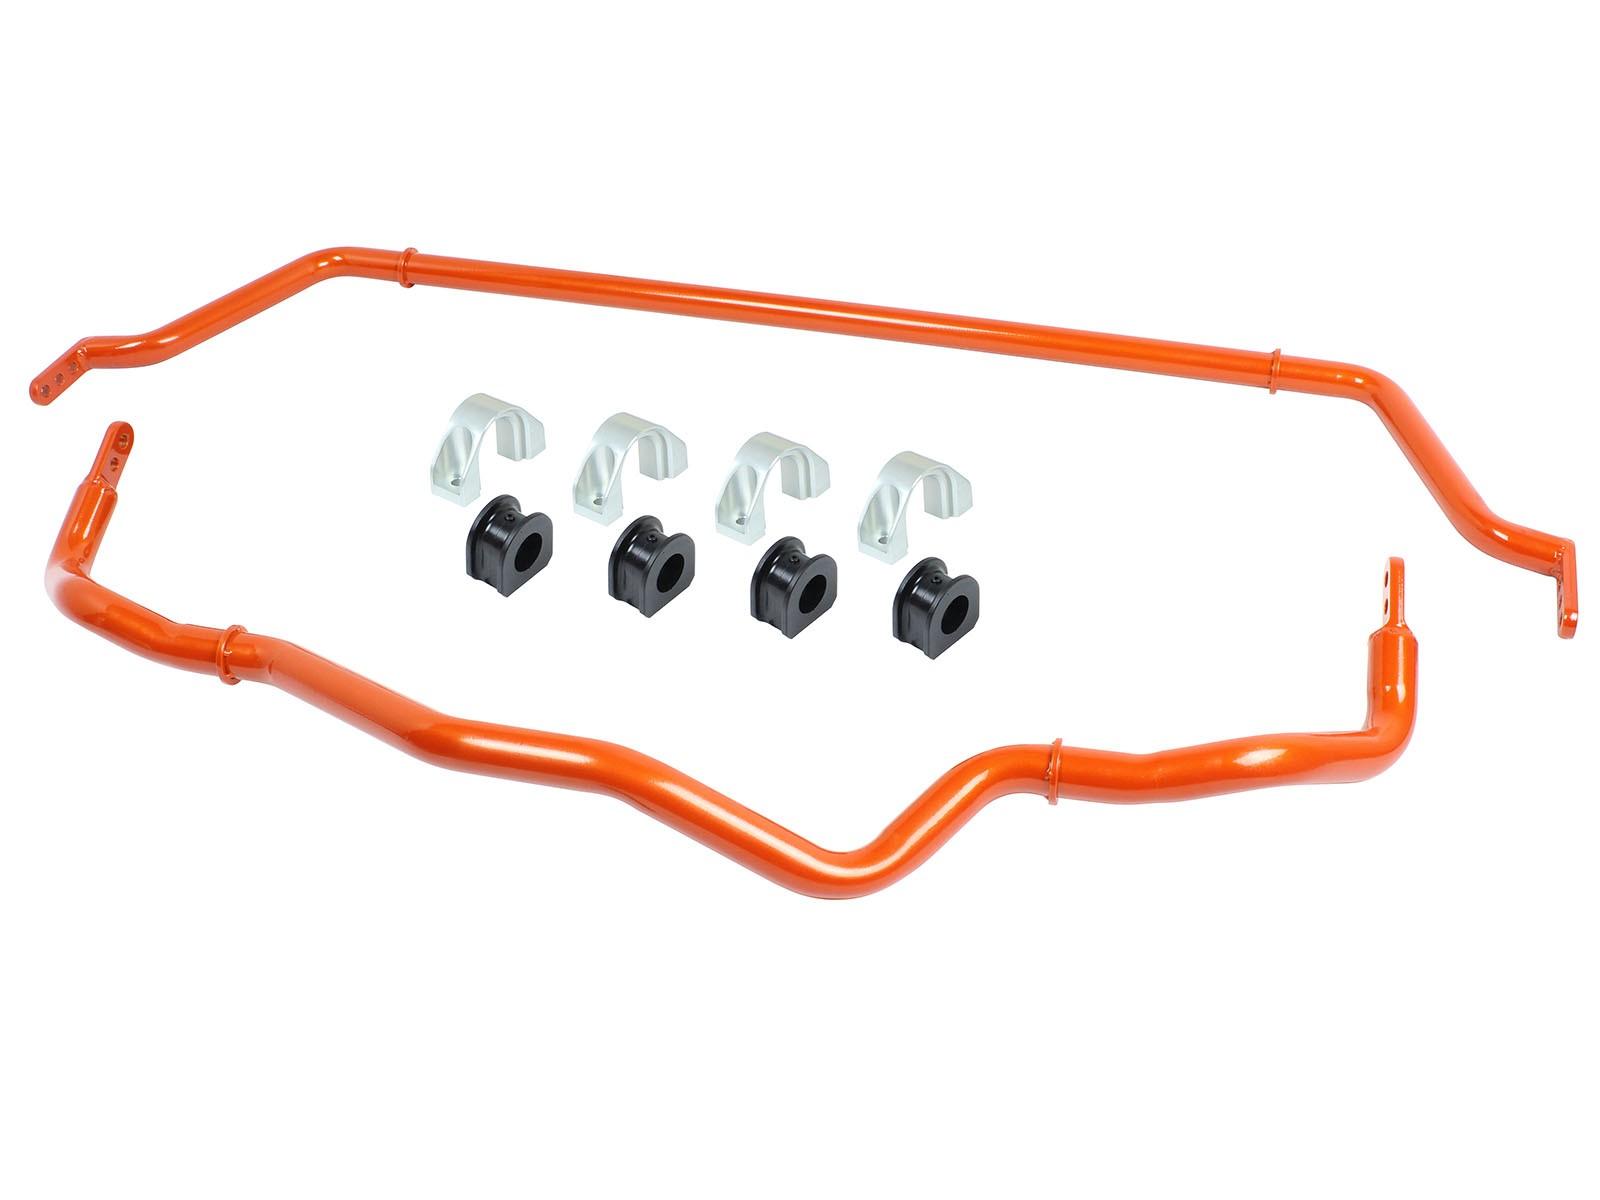 aFe POWER 440-402002-N aFe Control Sway Bar Set